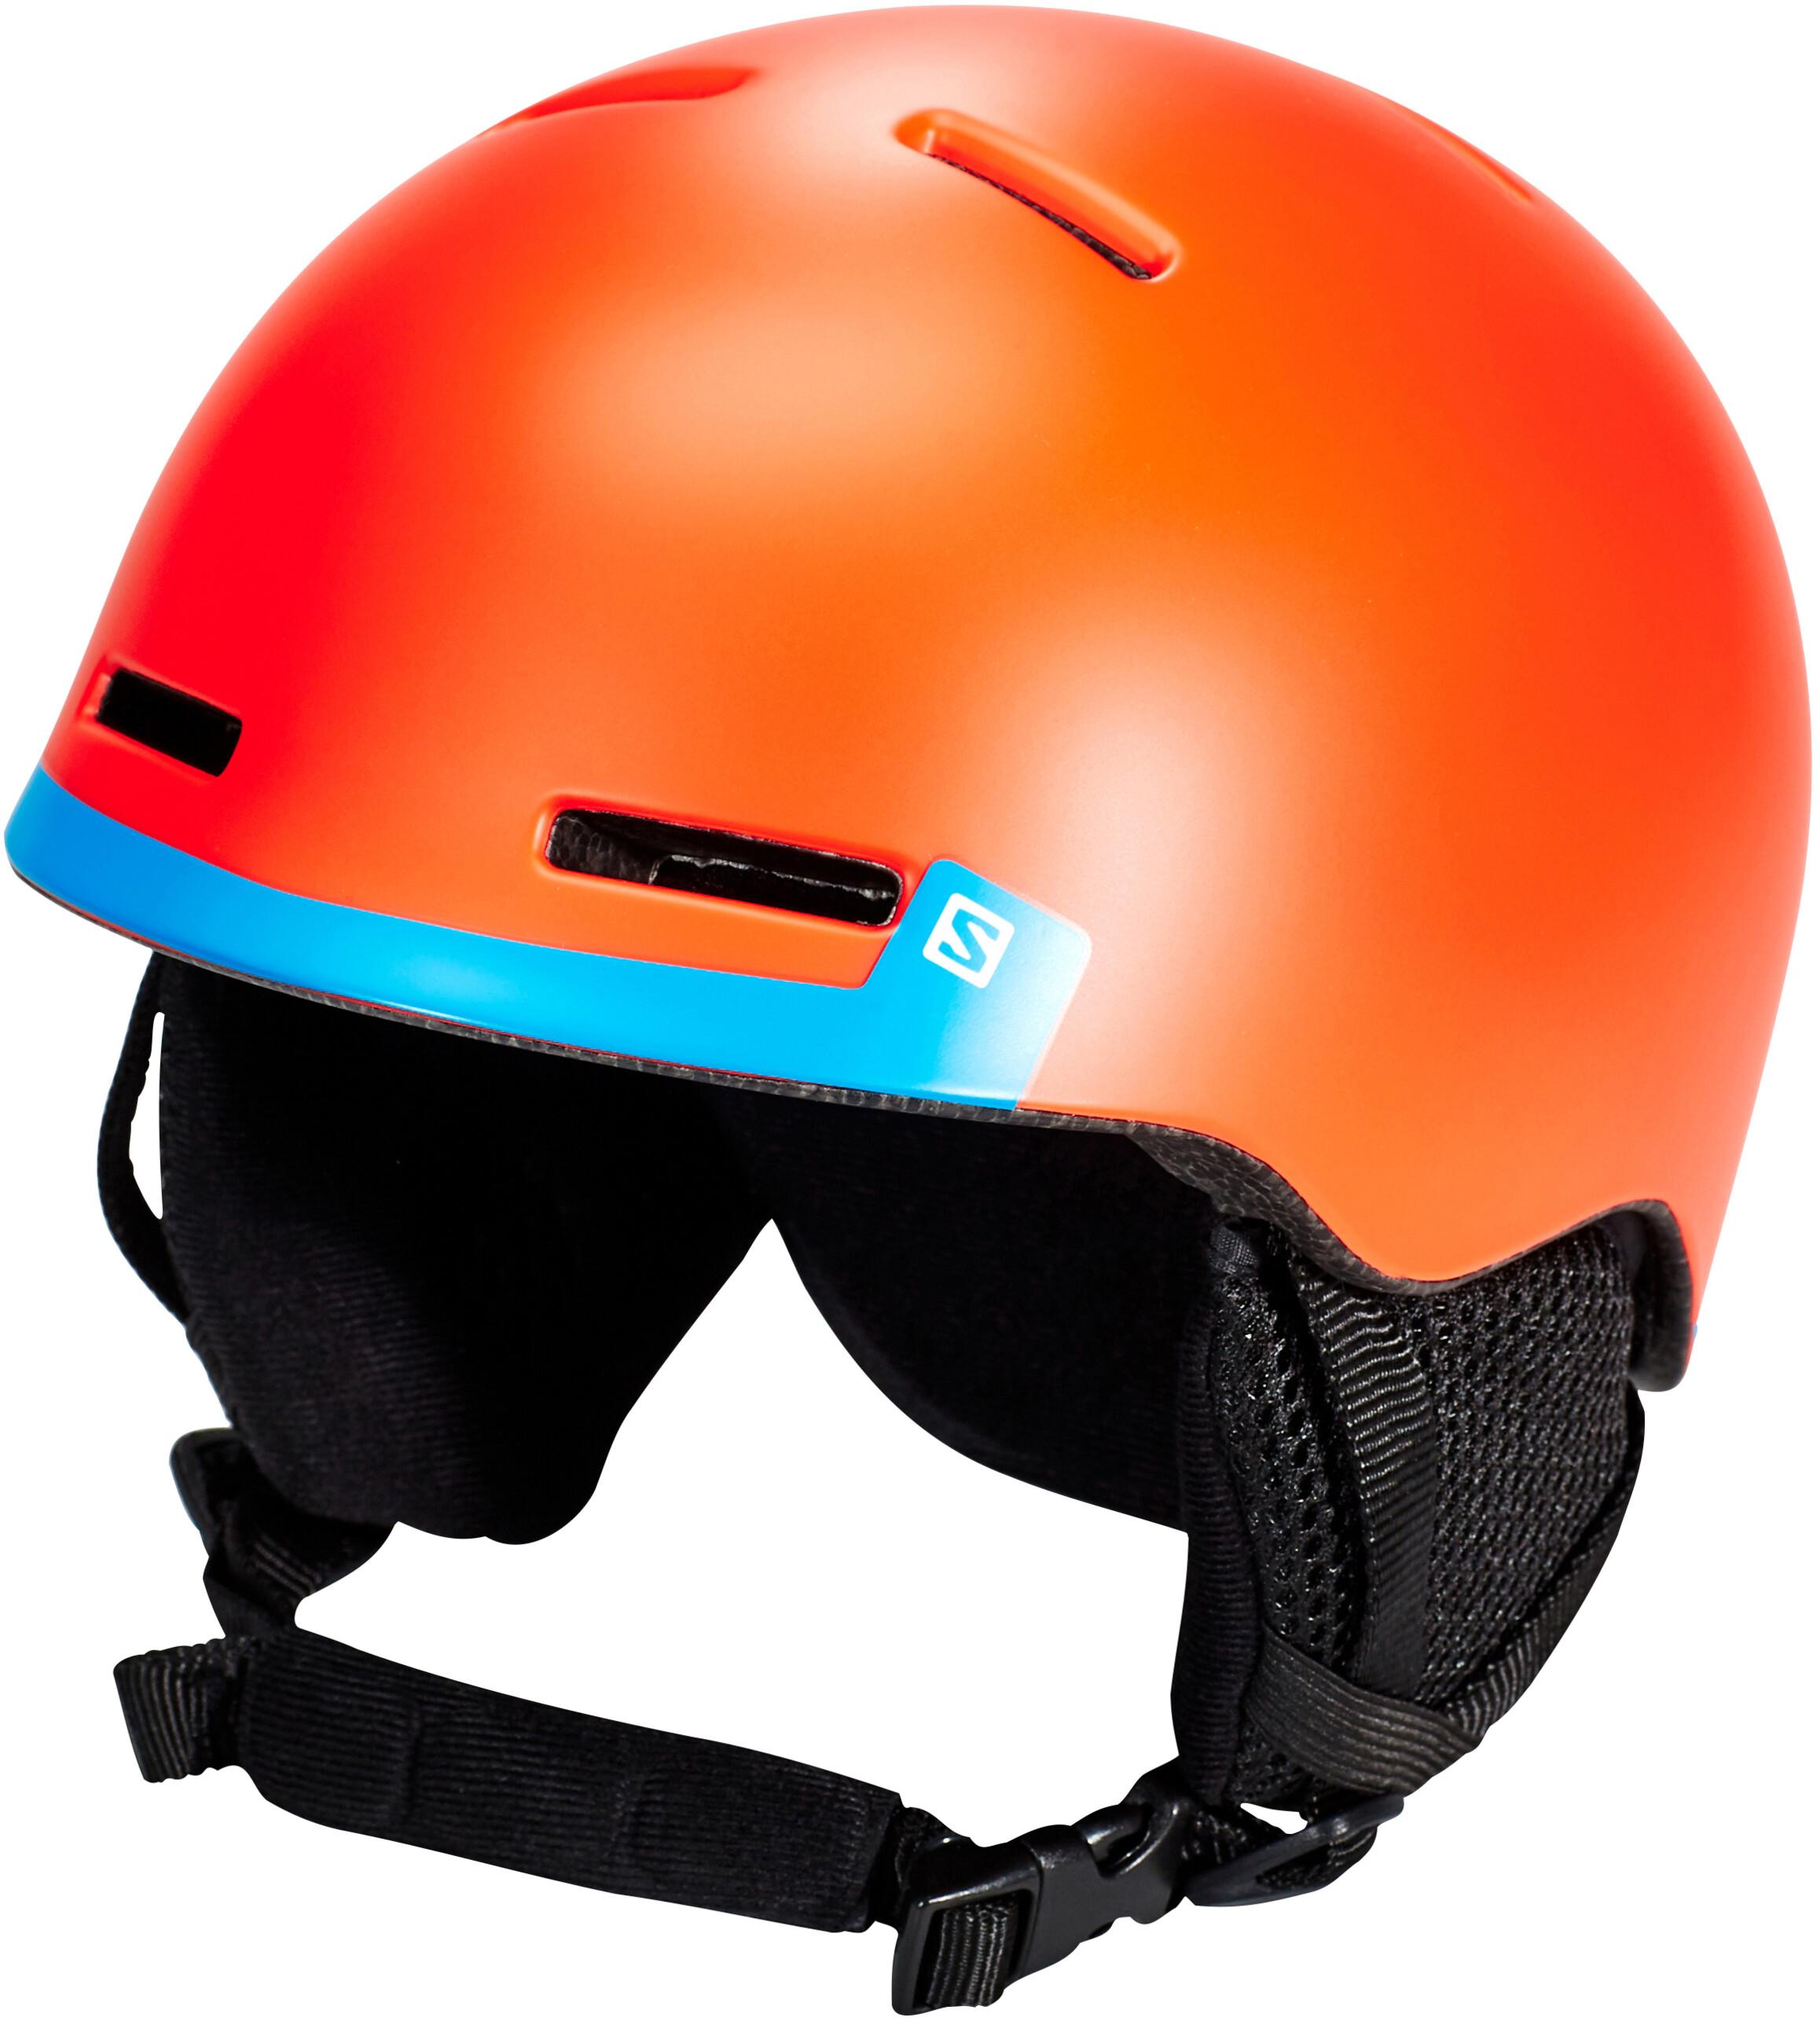 64167eecfa60 Salomon Grom Helmet orange turquoise at Addnature.co.uk